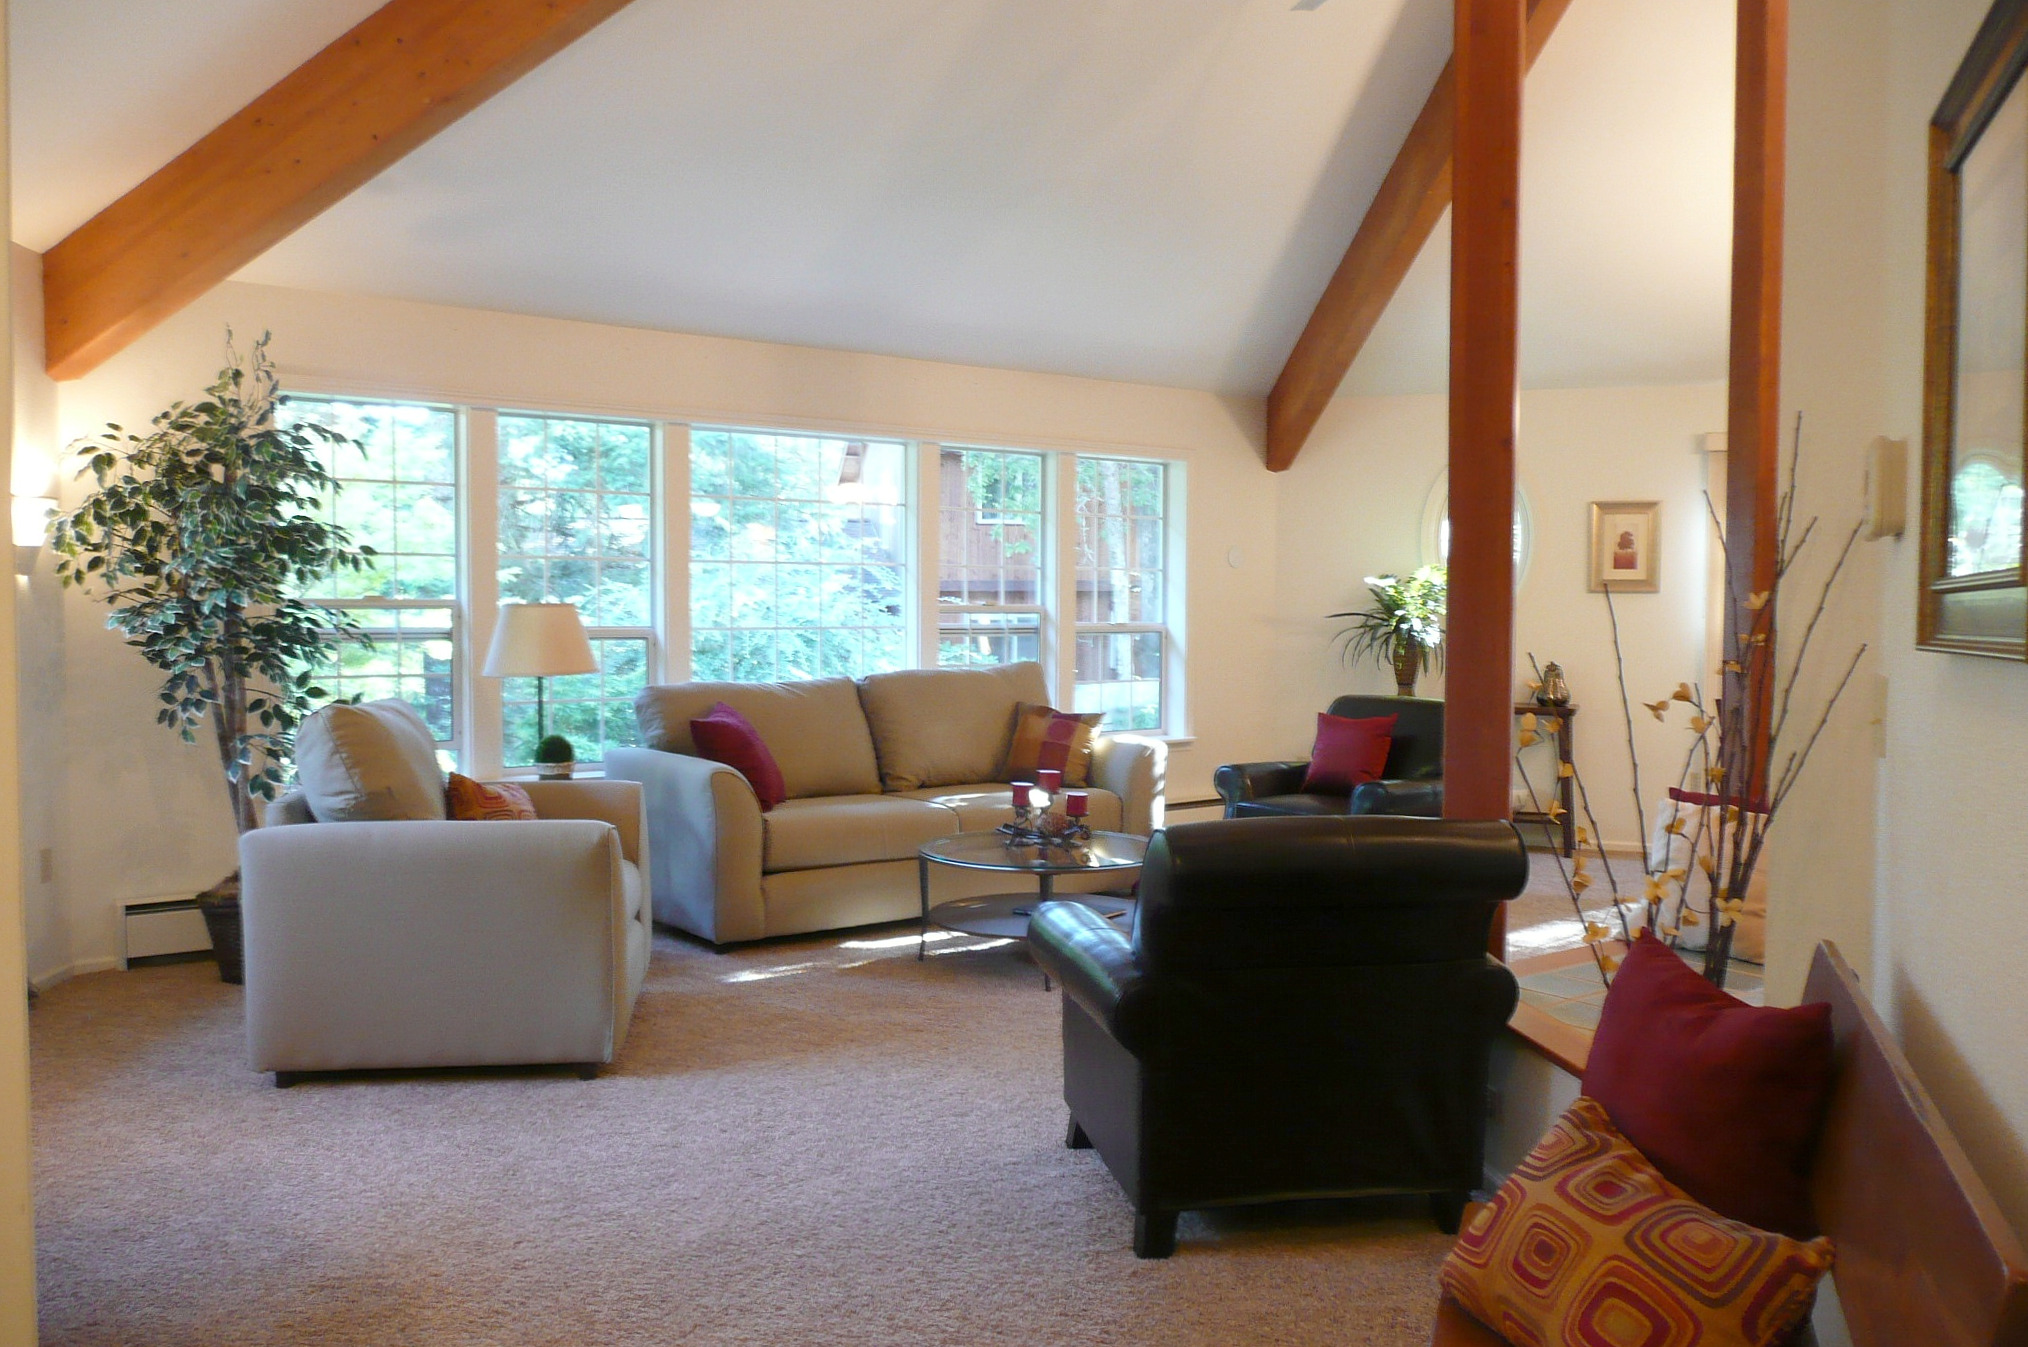 furniture helps define room sizes